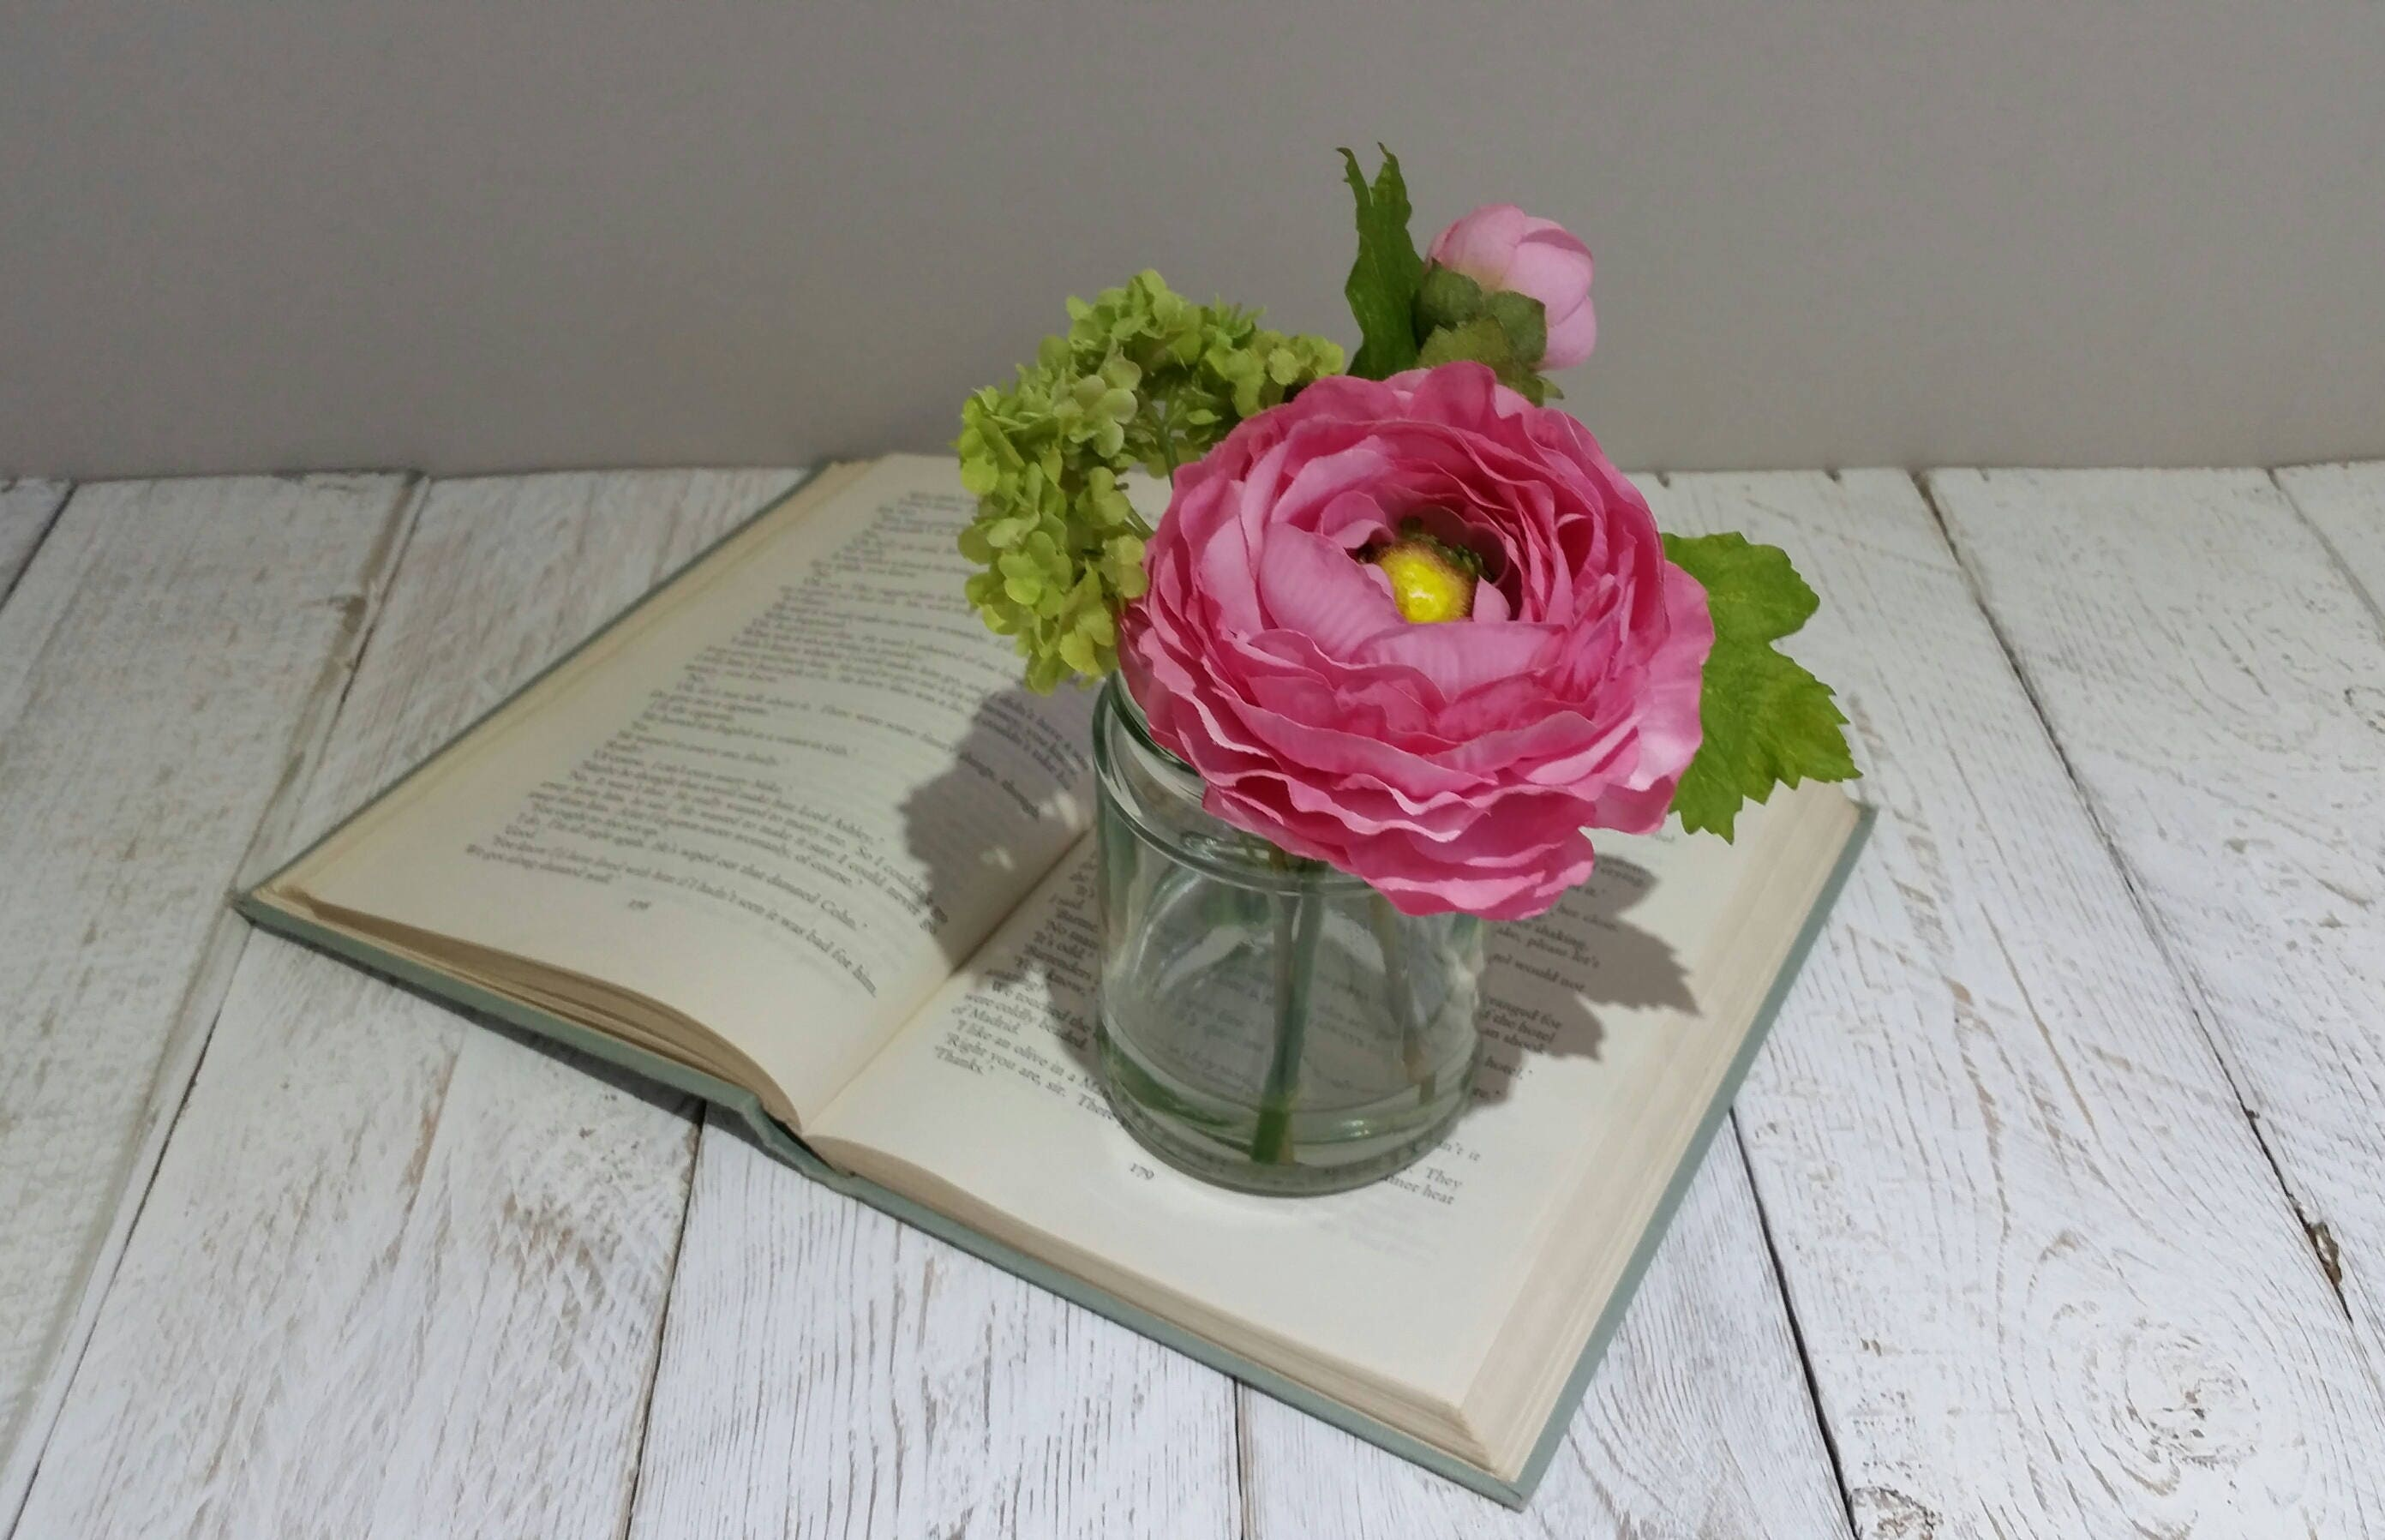 Rosa Seide Ranunkeln Blumen in Marmelade Glas Vase Kalk Laub | Etsy